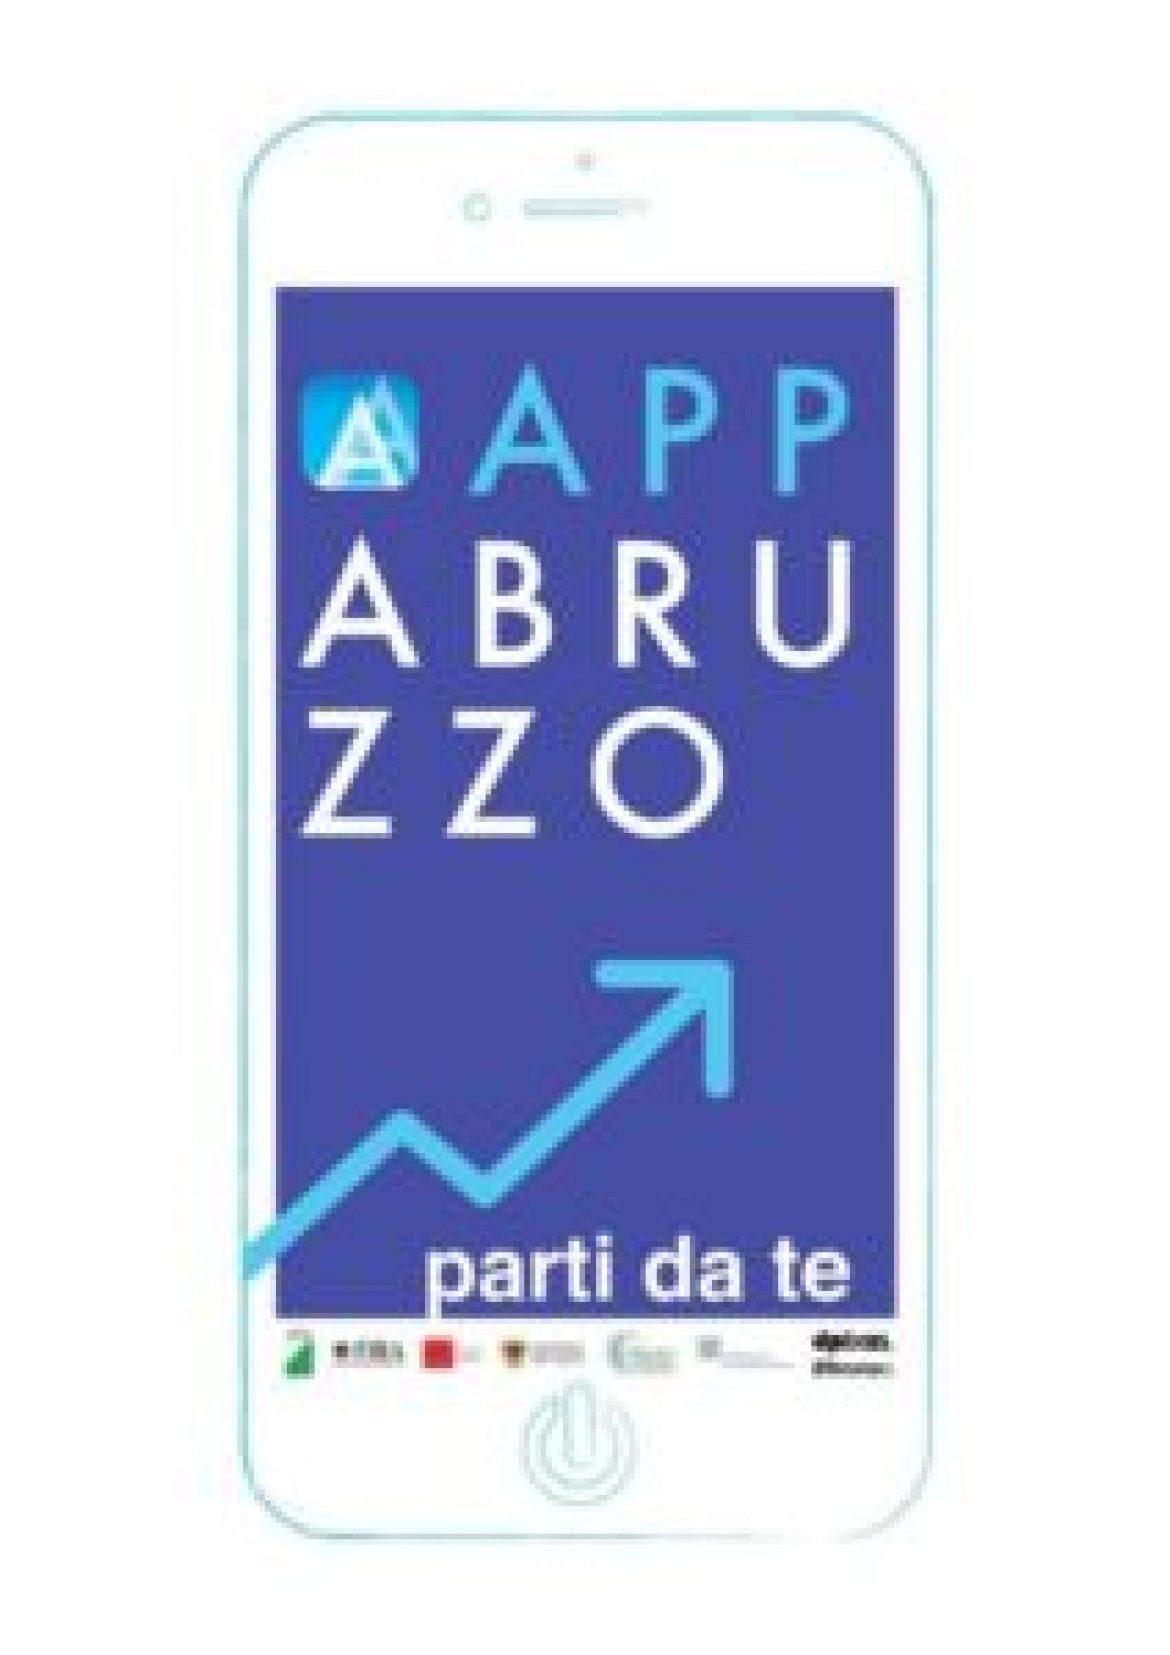 Bando regionale da 1,5 mln di euro per imprenditori digitali